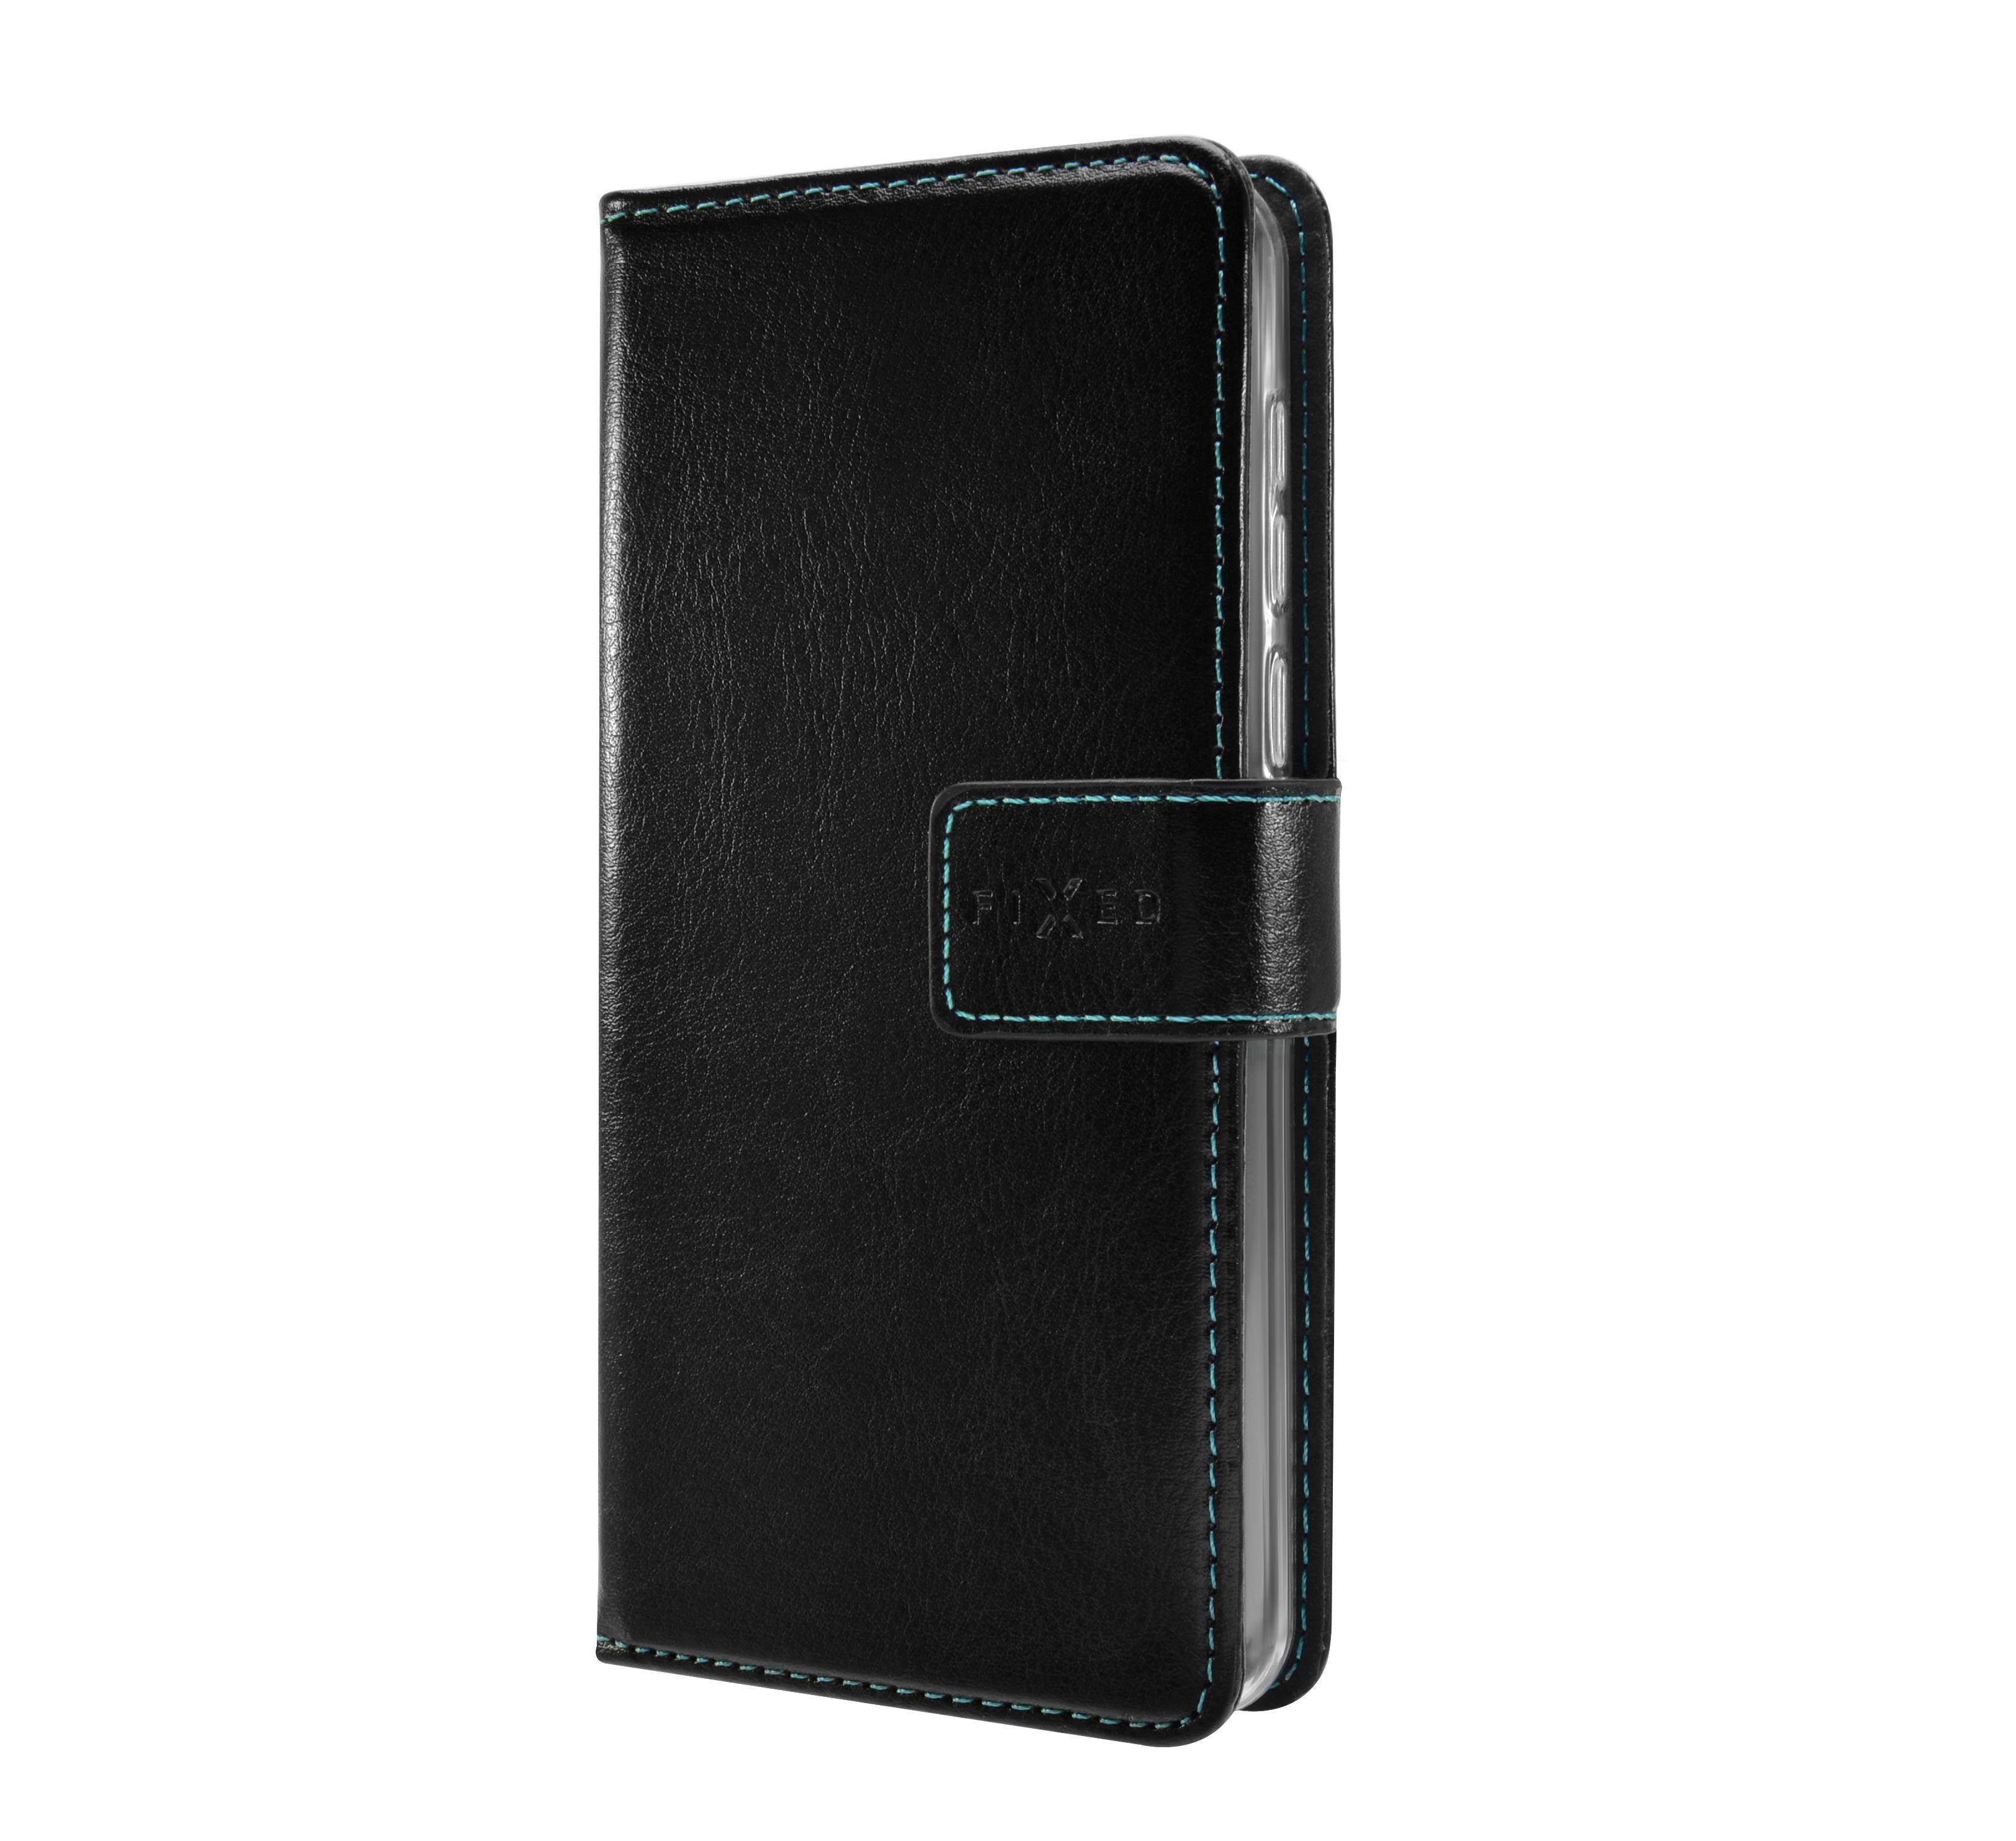 Pouzdro typu kniha FIXED Opus pro Huawei Y9 (2019), černé